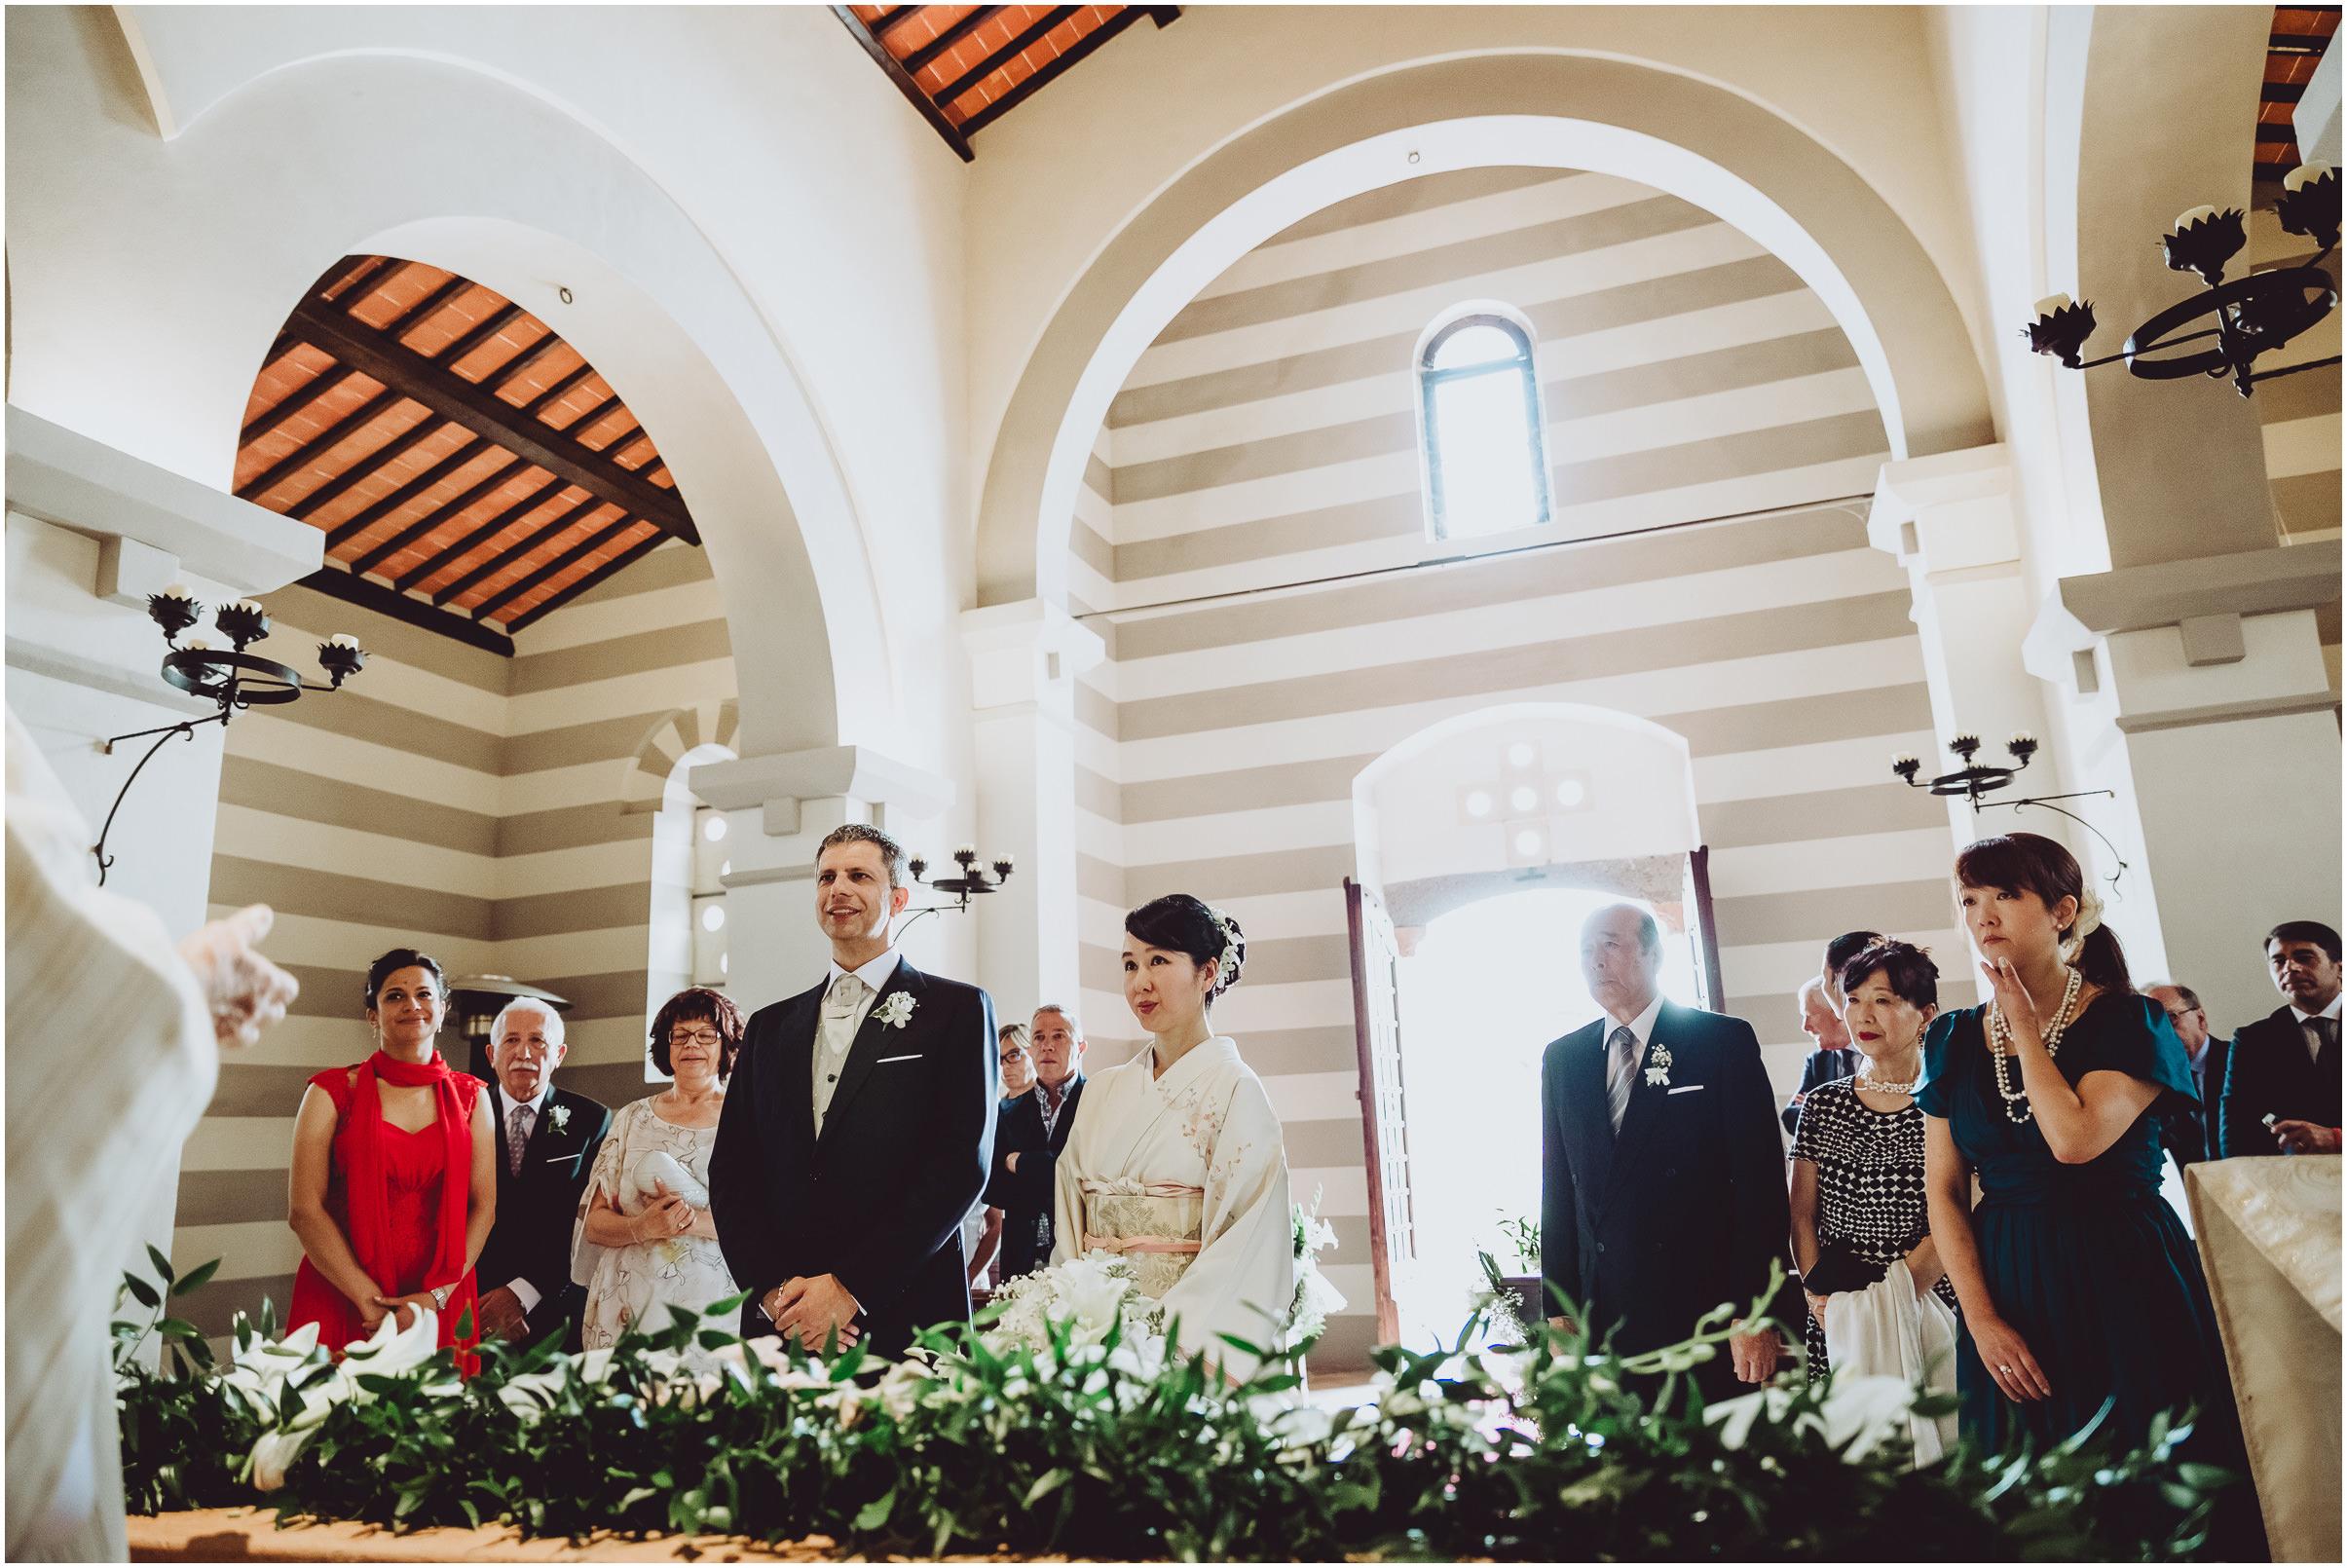 WEDDING-PHOTOGRAPHY-SARA-LORENZONI-FOTOGRAFIA-MATRIMONIO-ORVIETO-JUKA-ANTONELLO11